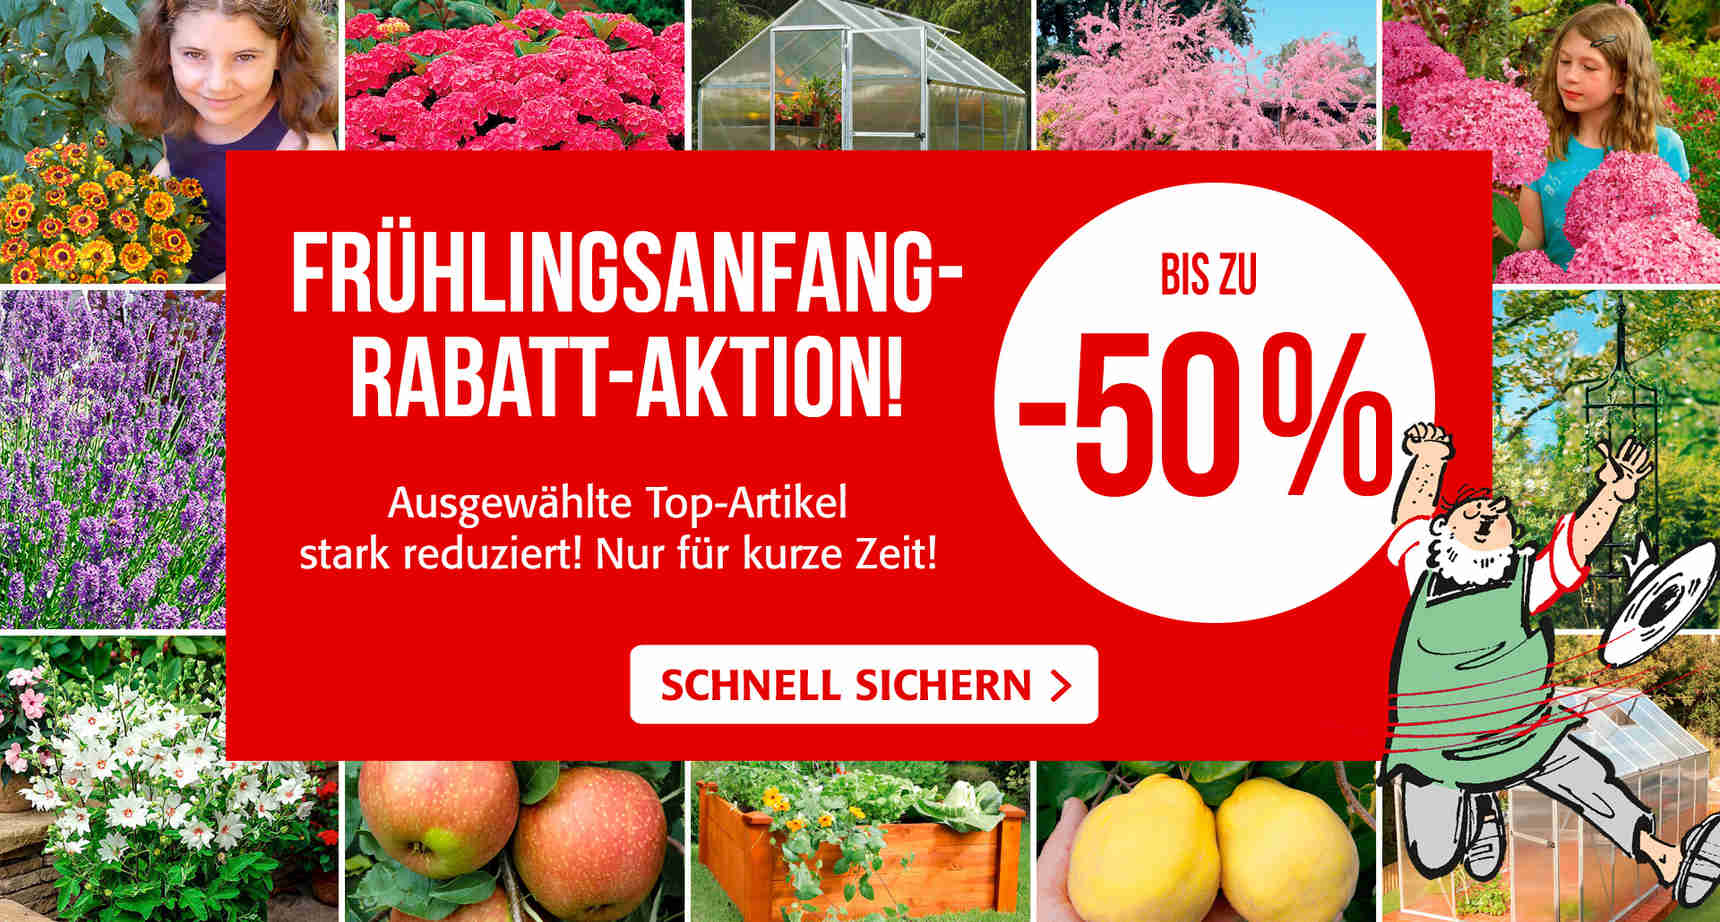 +++ (1) Frühlings-Aktion +++ - 3